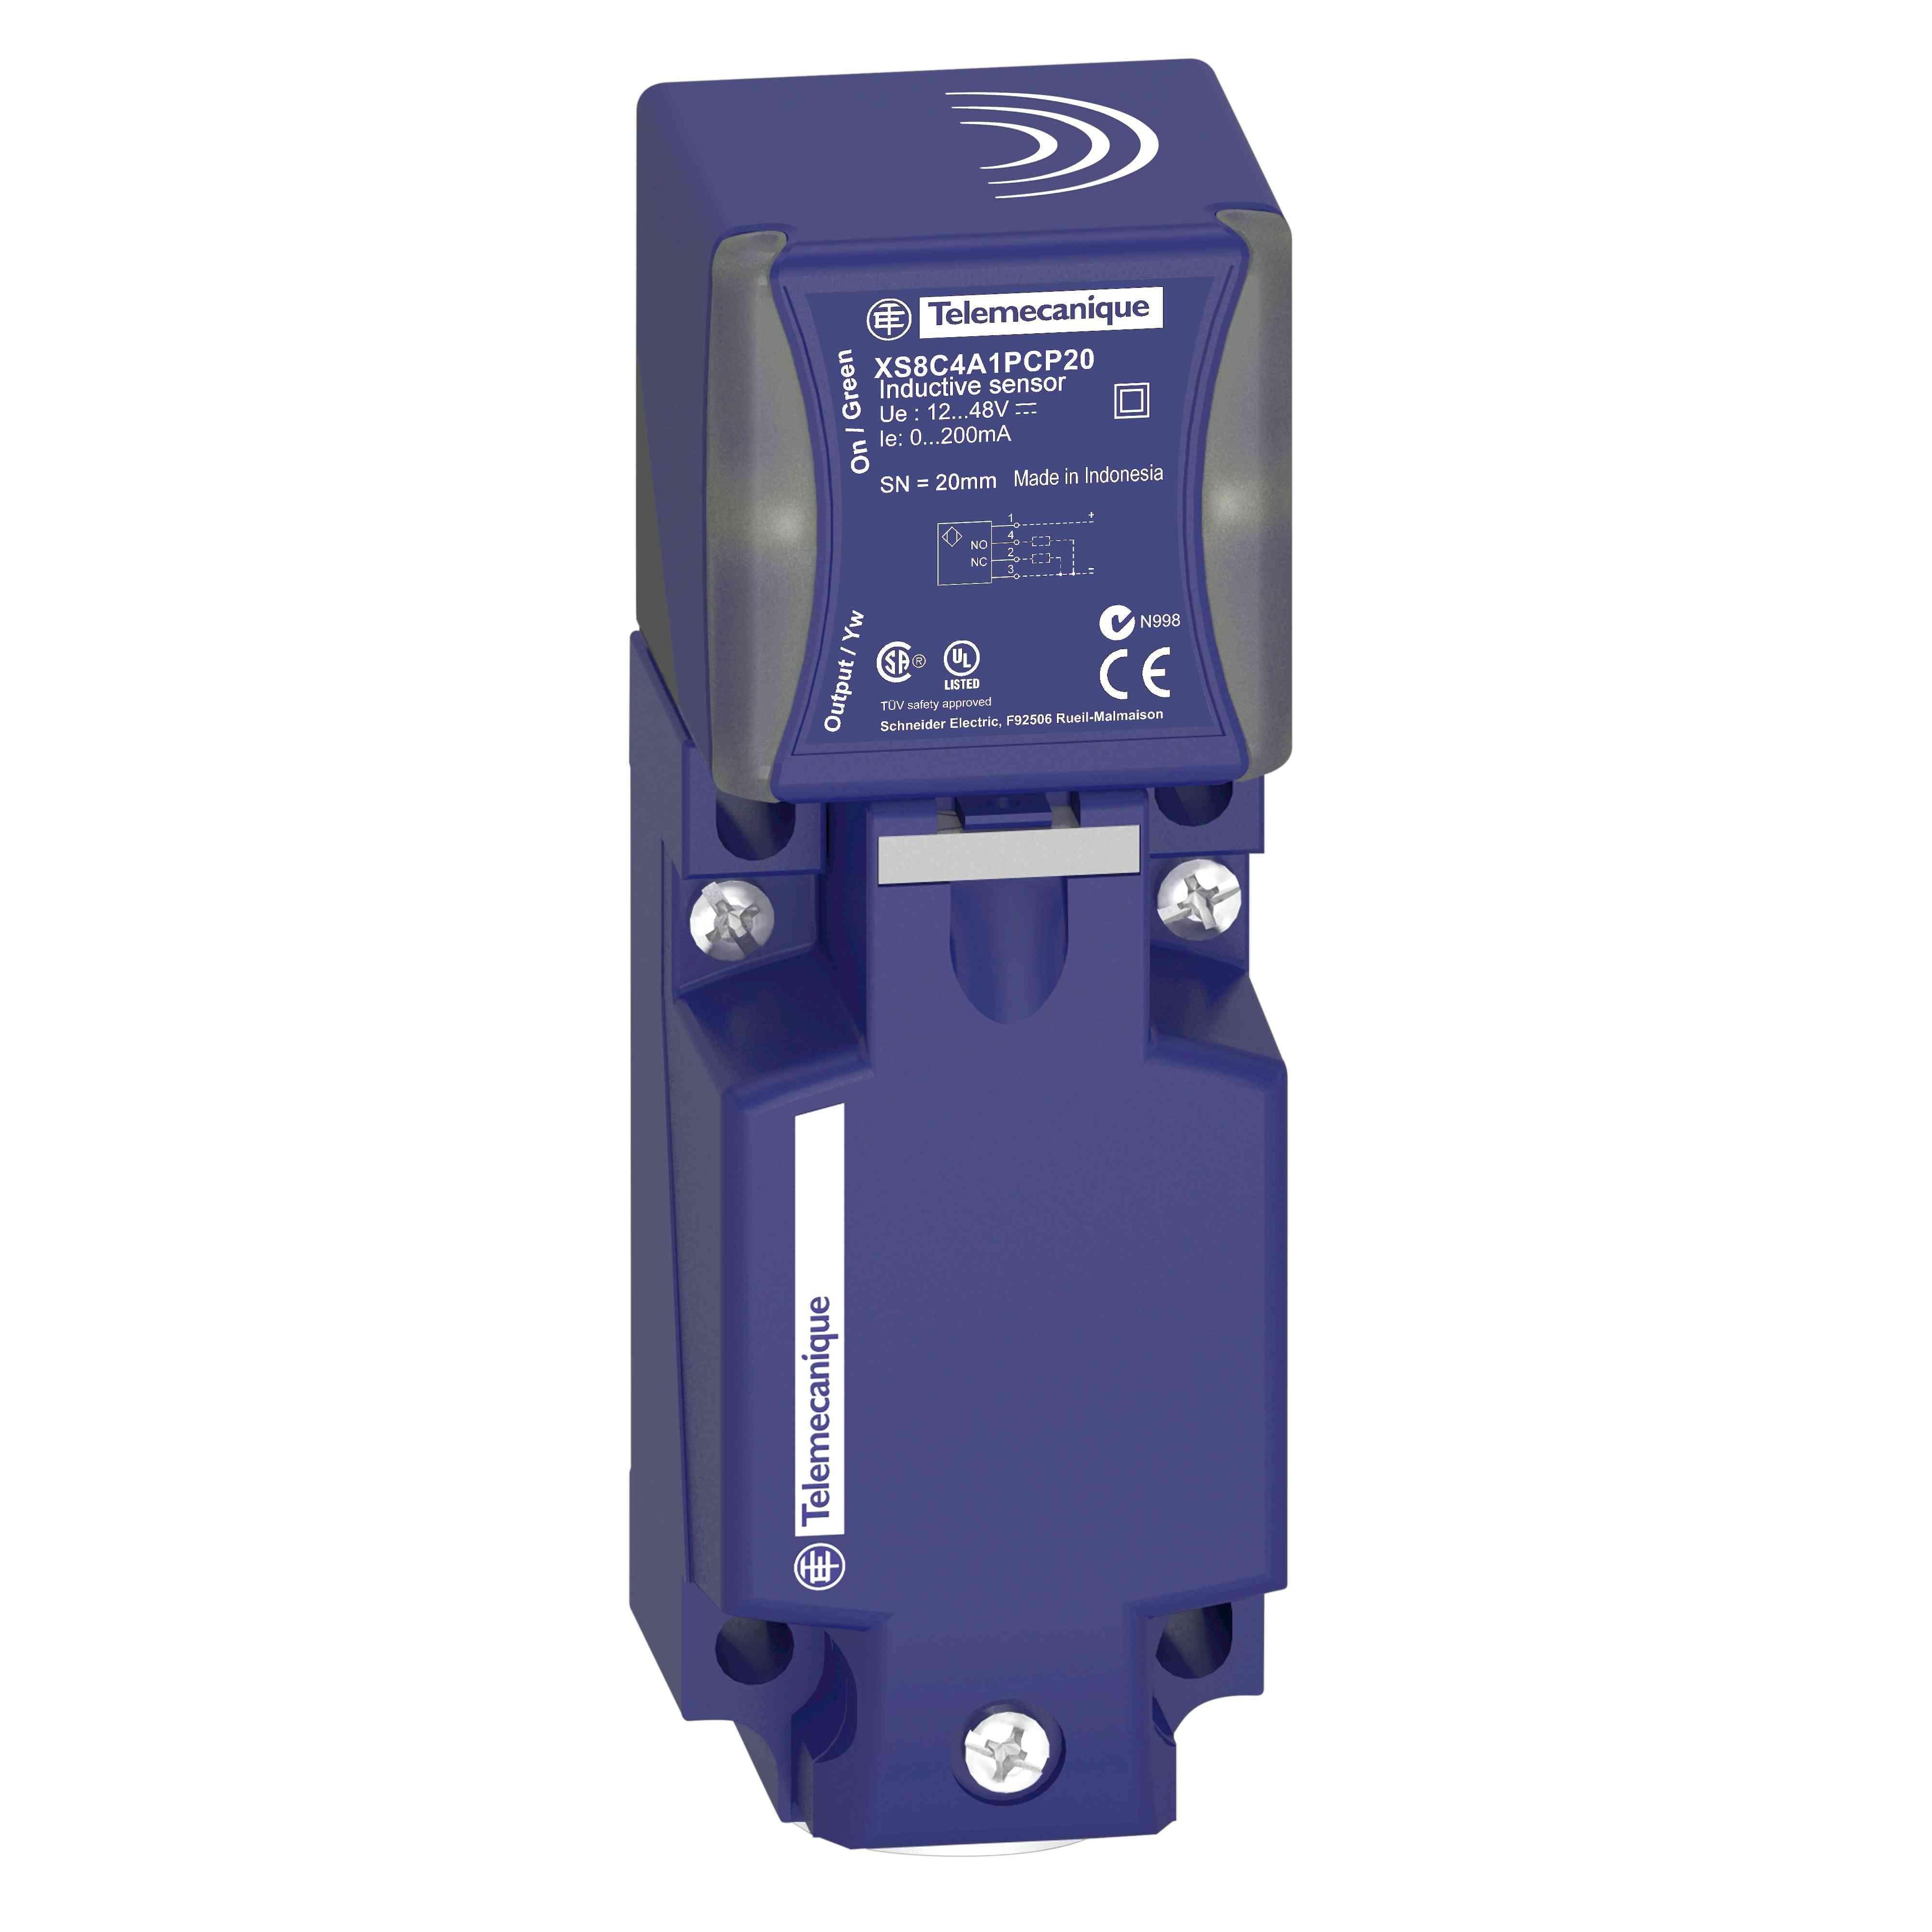 Induktivni senzor XS8 40x40x117 - PBT - Sn 40 mm - 12 do 48 V DC - priključki